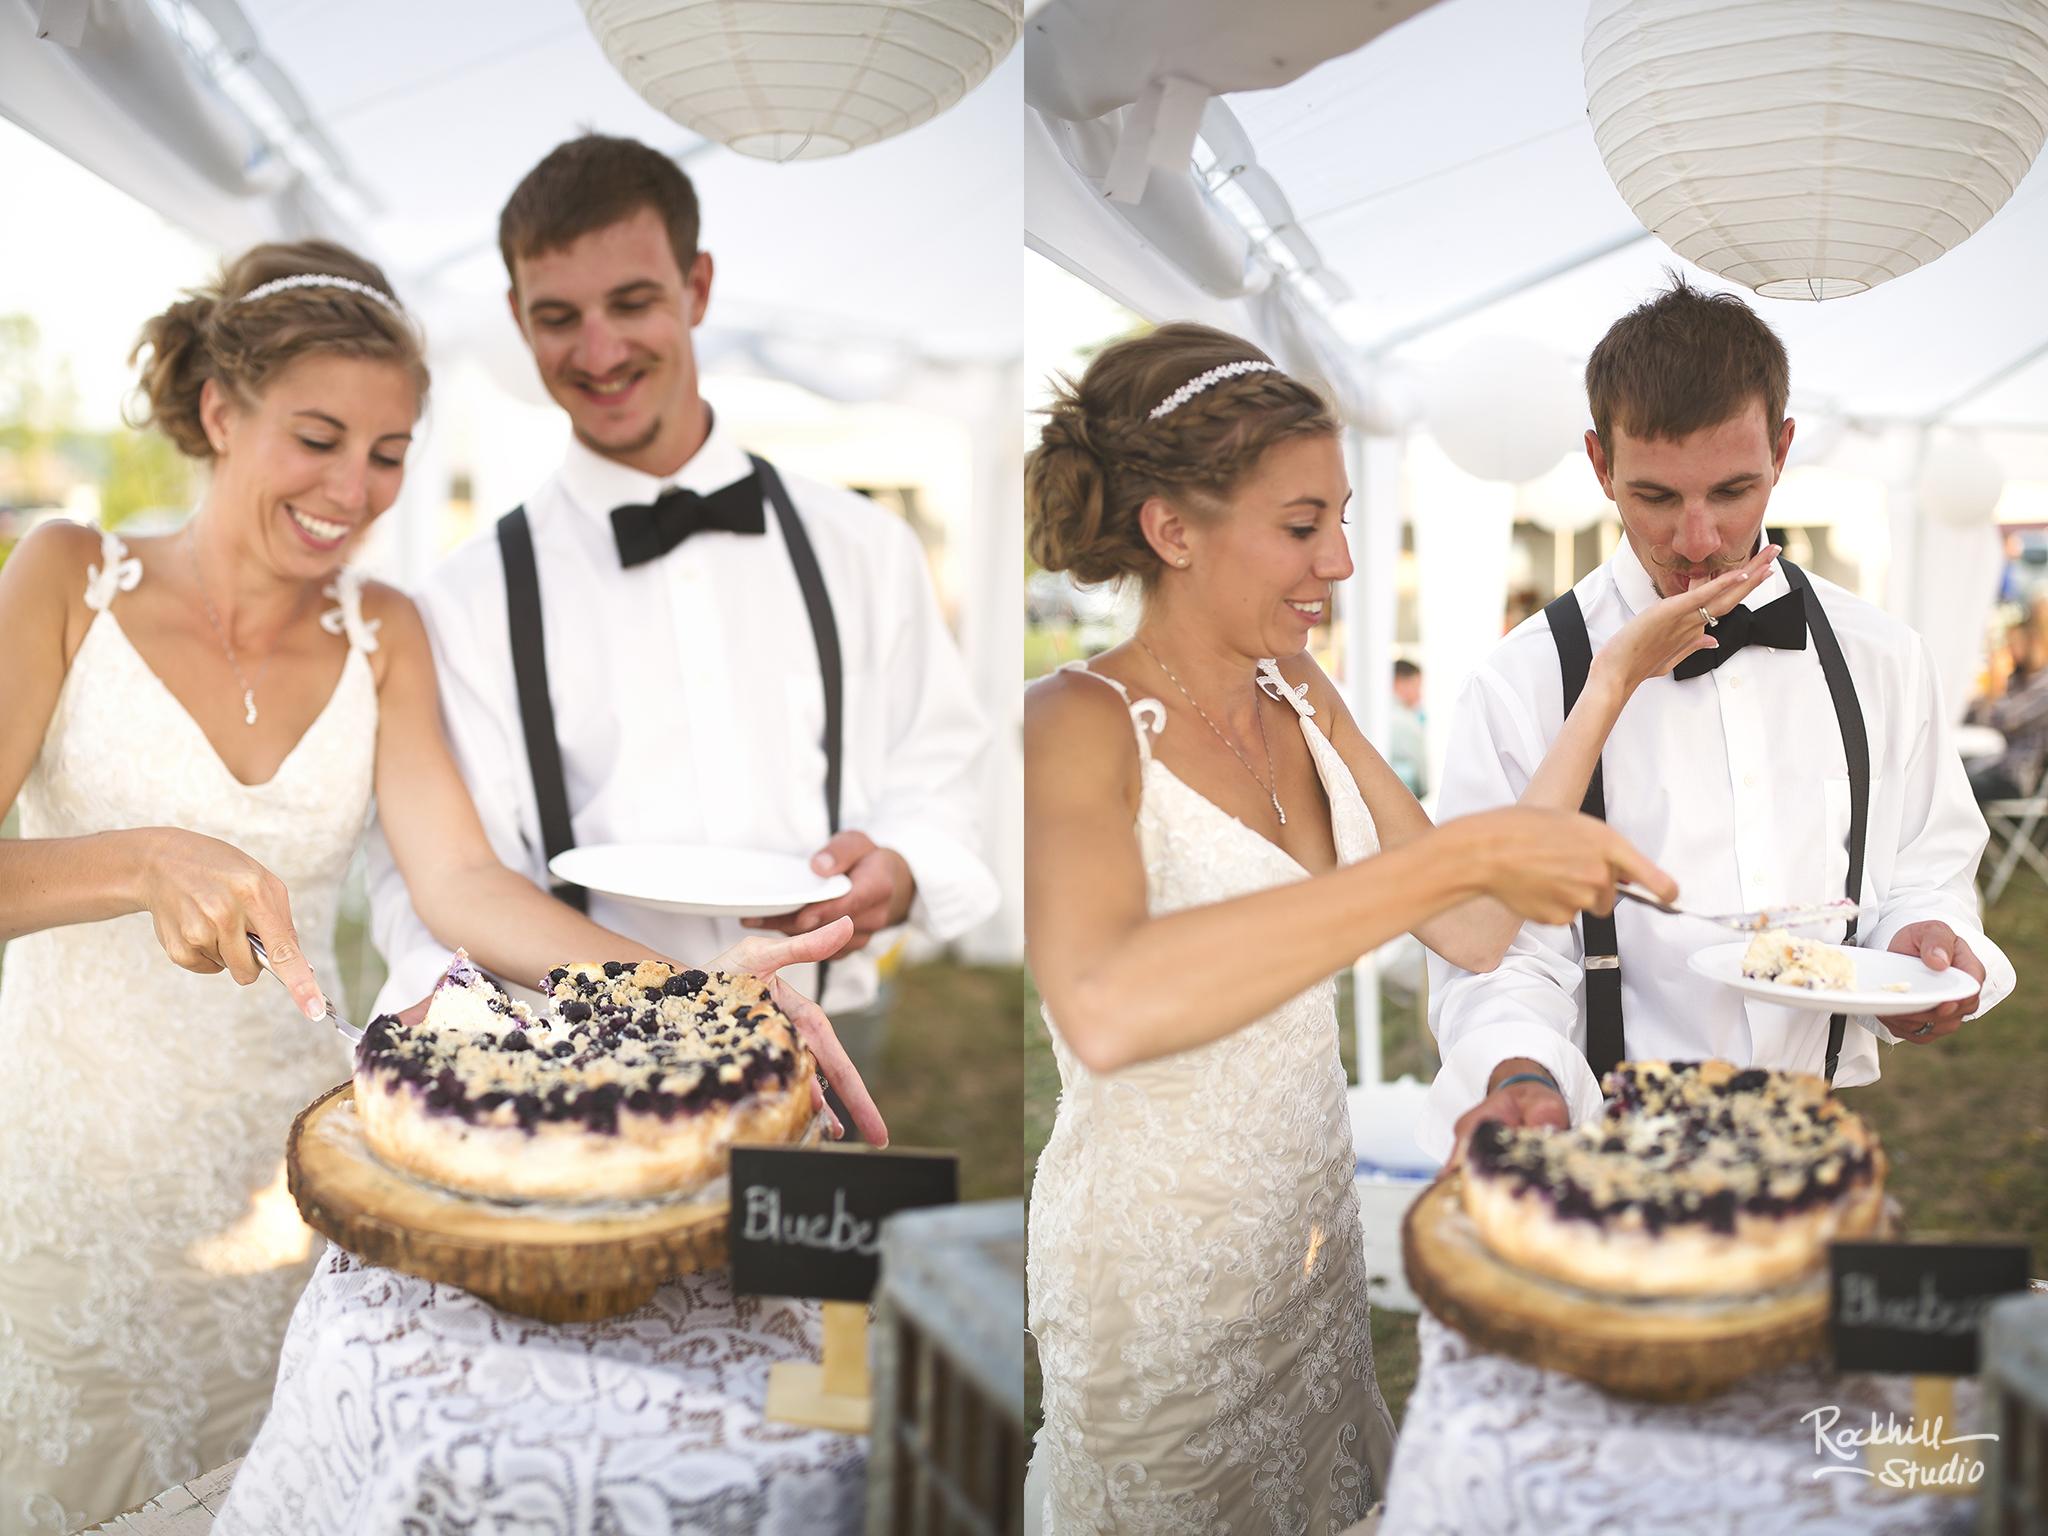 marquette-wedding-photography-lake-superior-cake-cutting-bride-groom-michigan.jpg